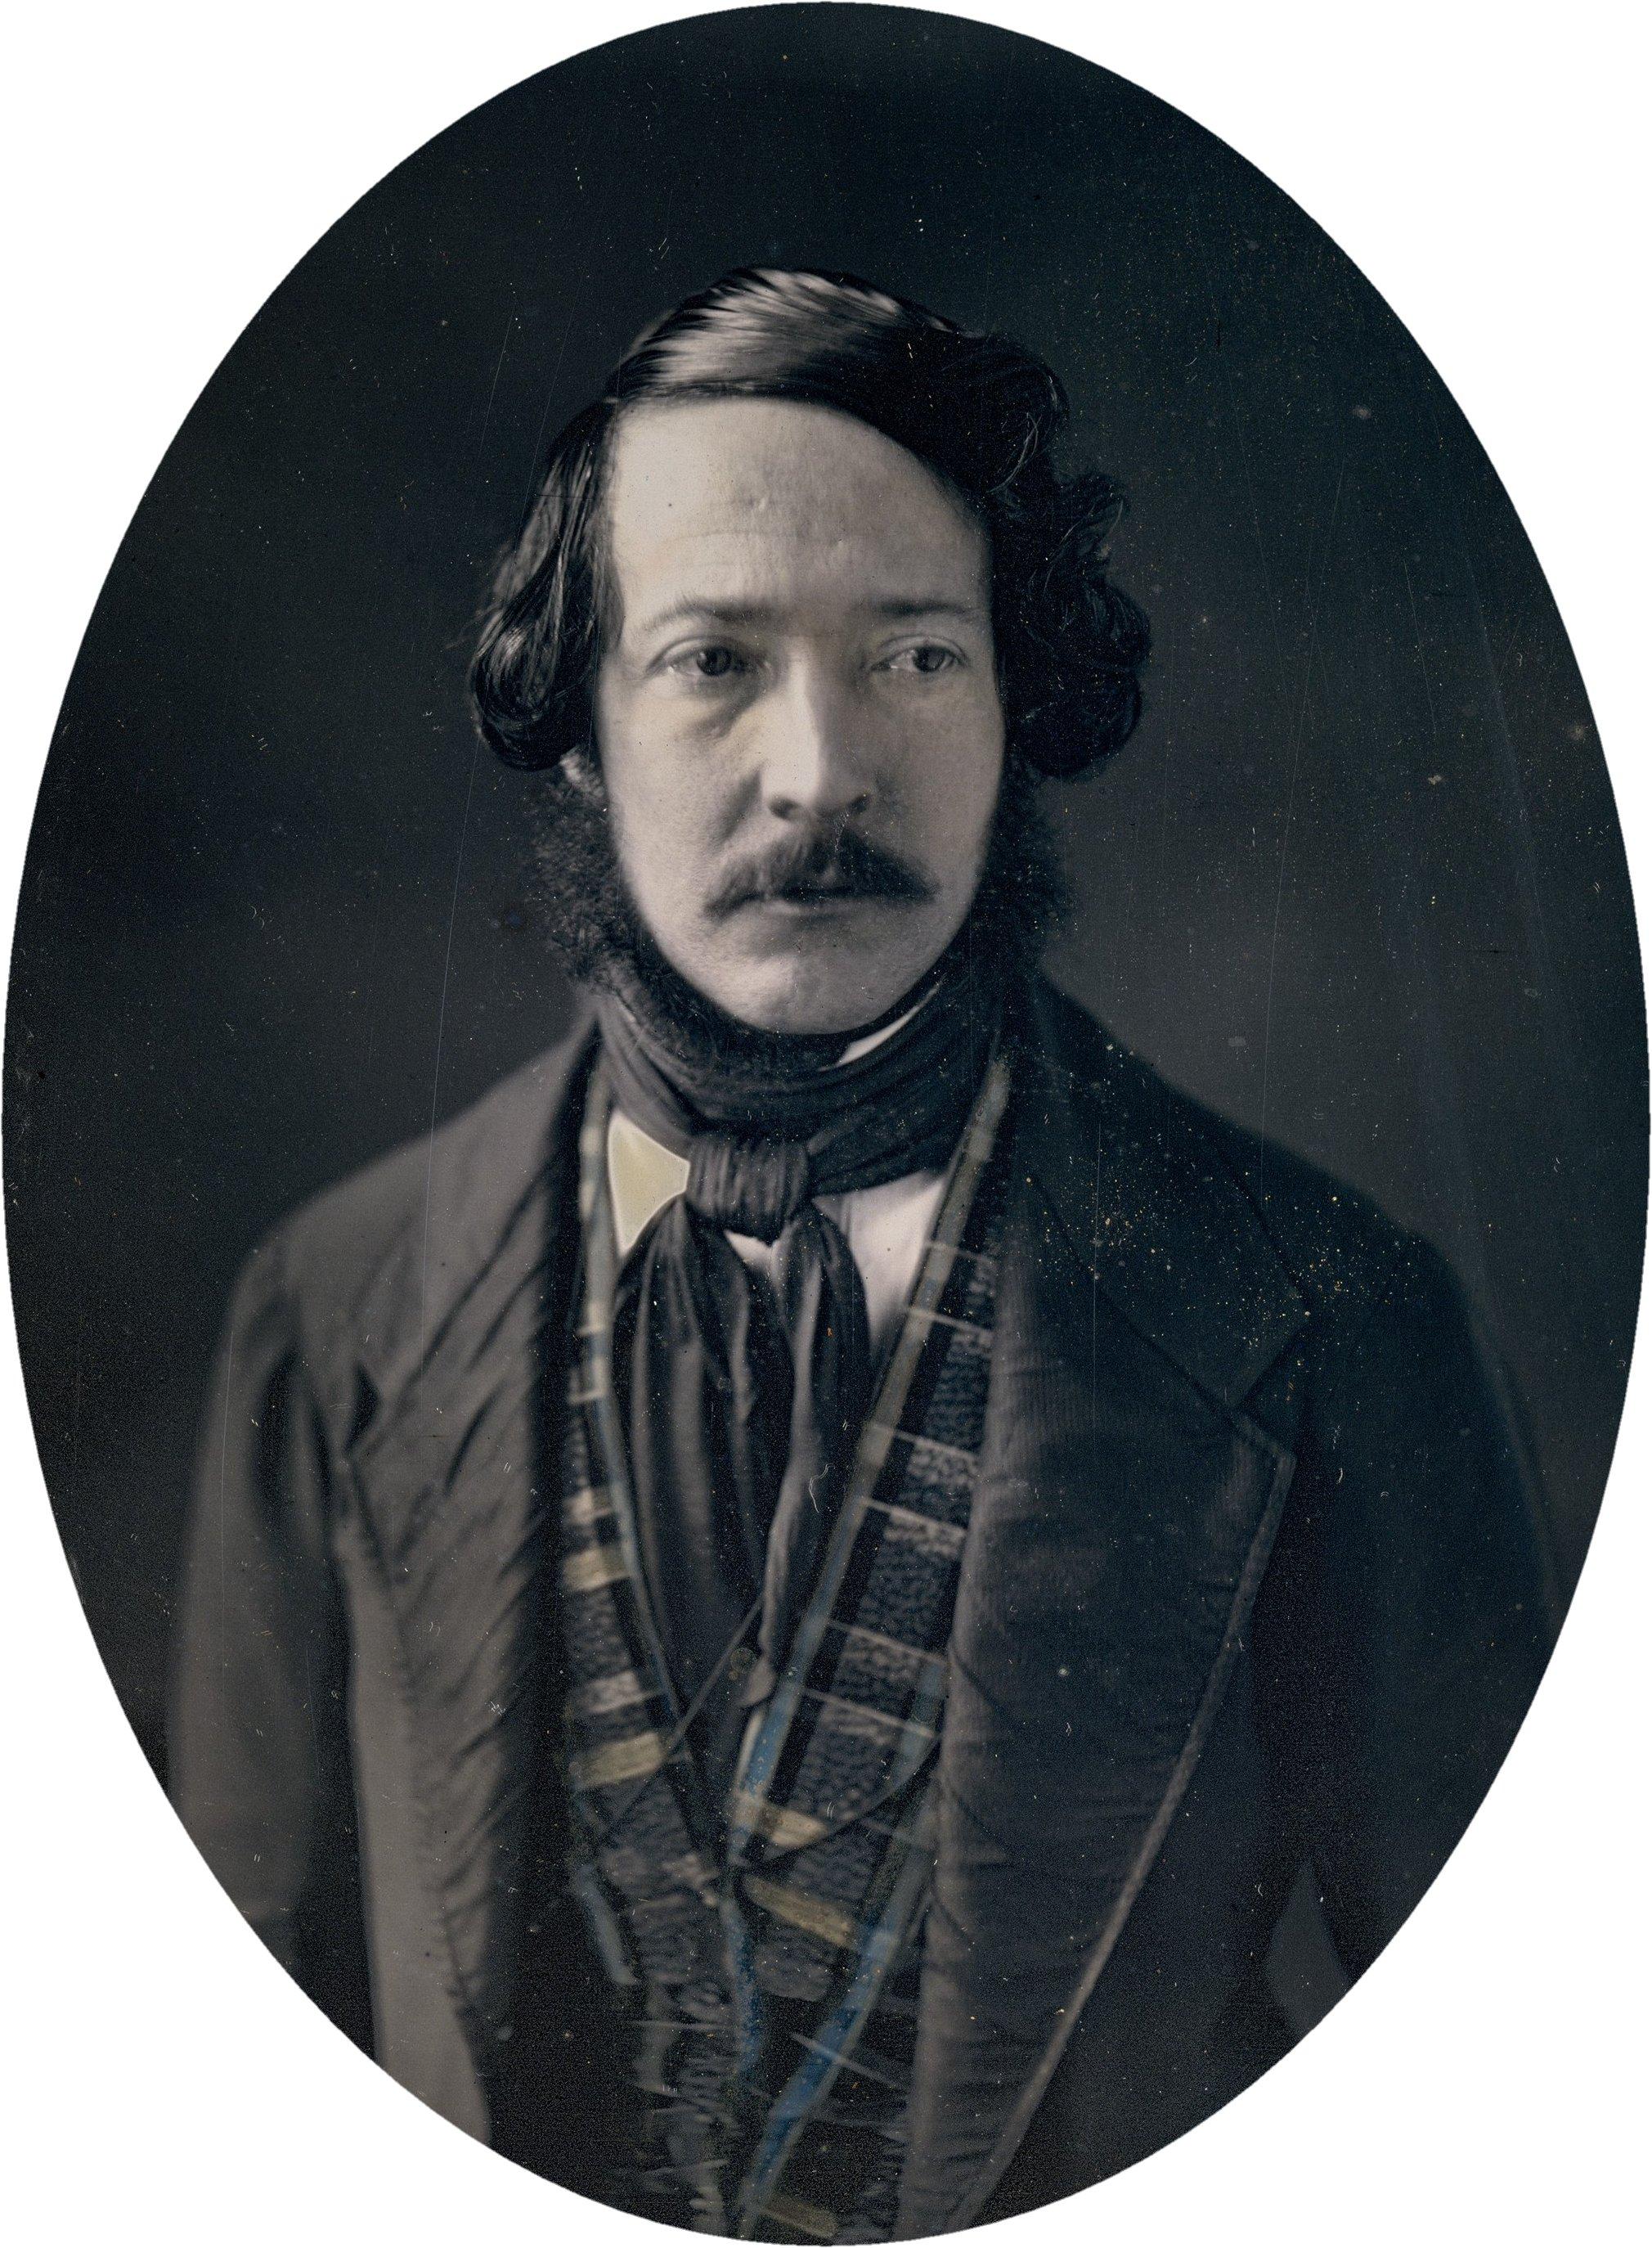 Image of Frederick Langenheim from Wikidata